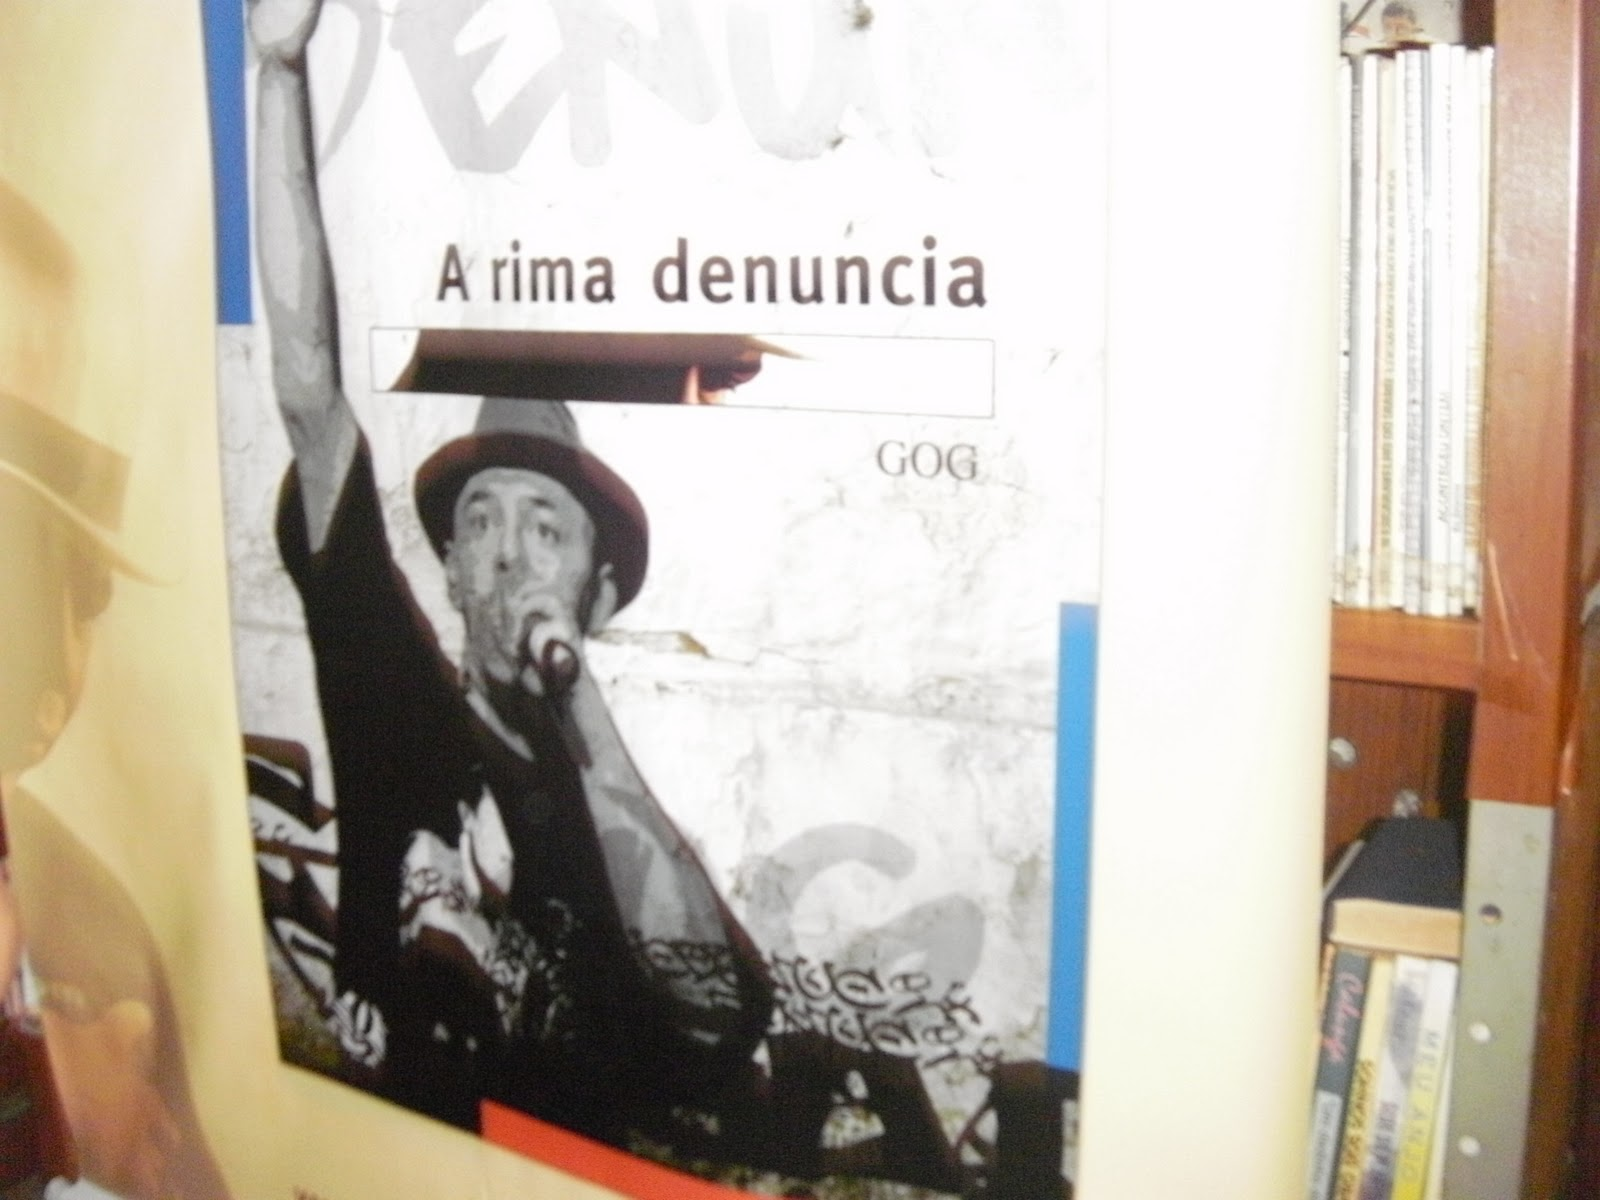 Coletivo cultural esperan a garcia 09 01 2010 10 01 2010 for A ultima porta jejum coletivo